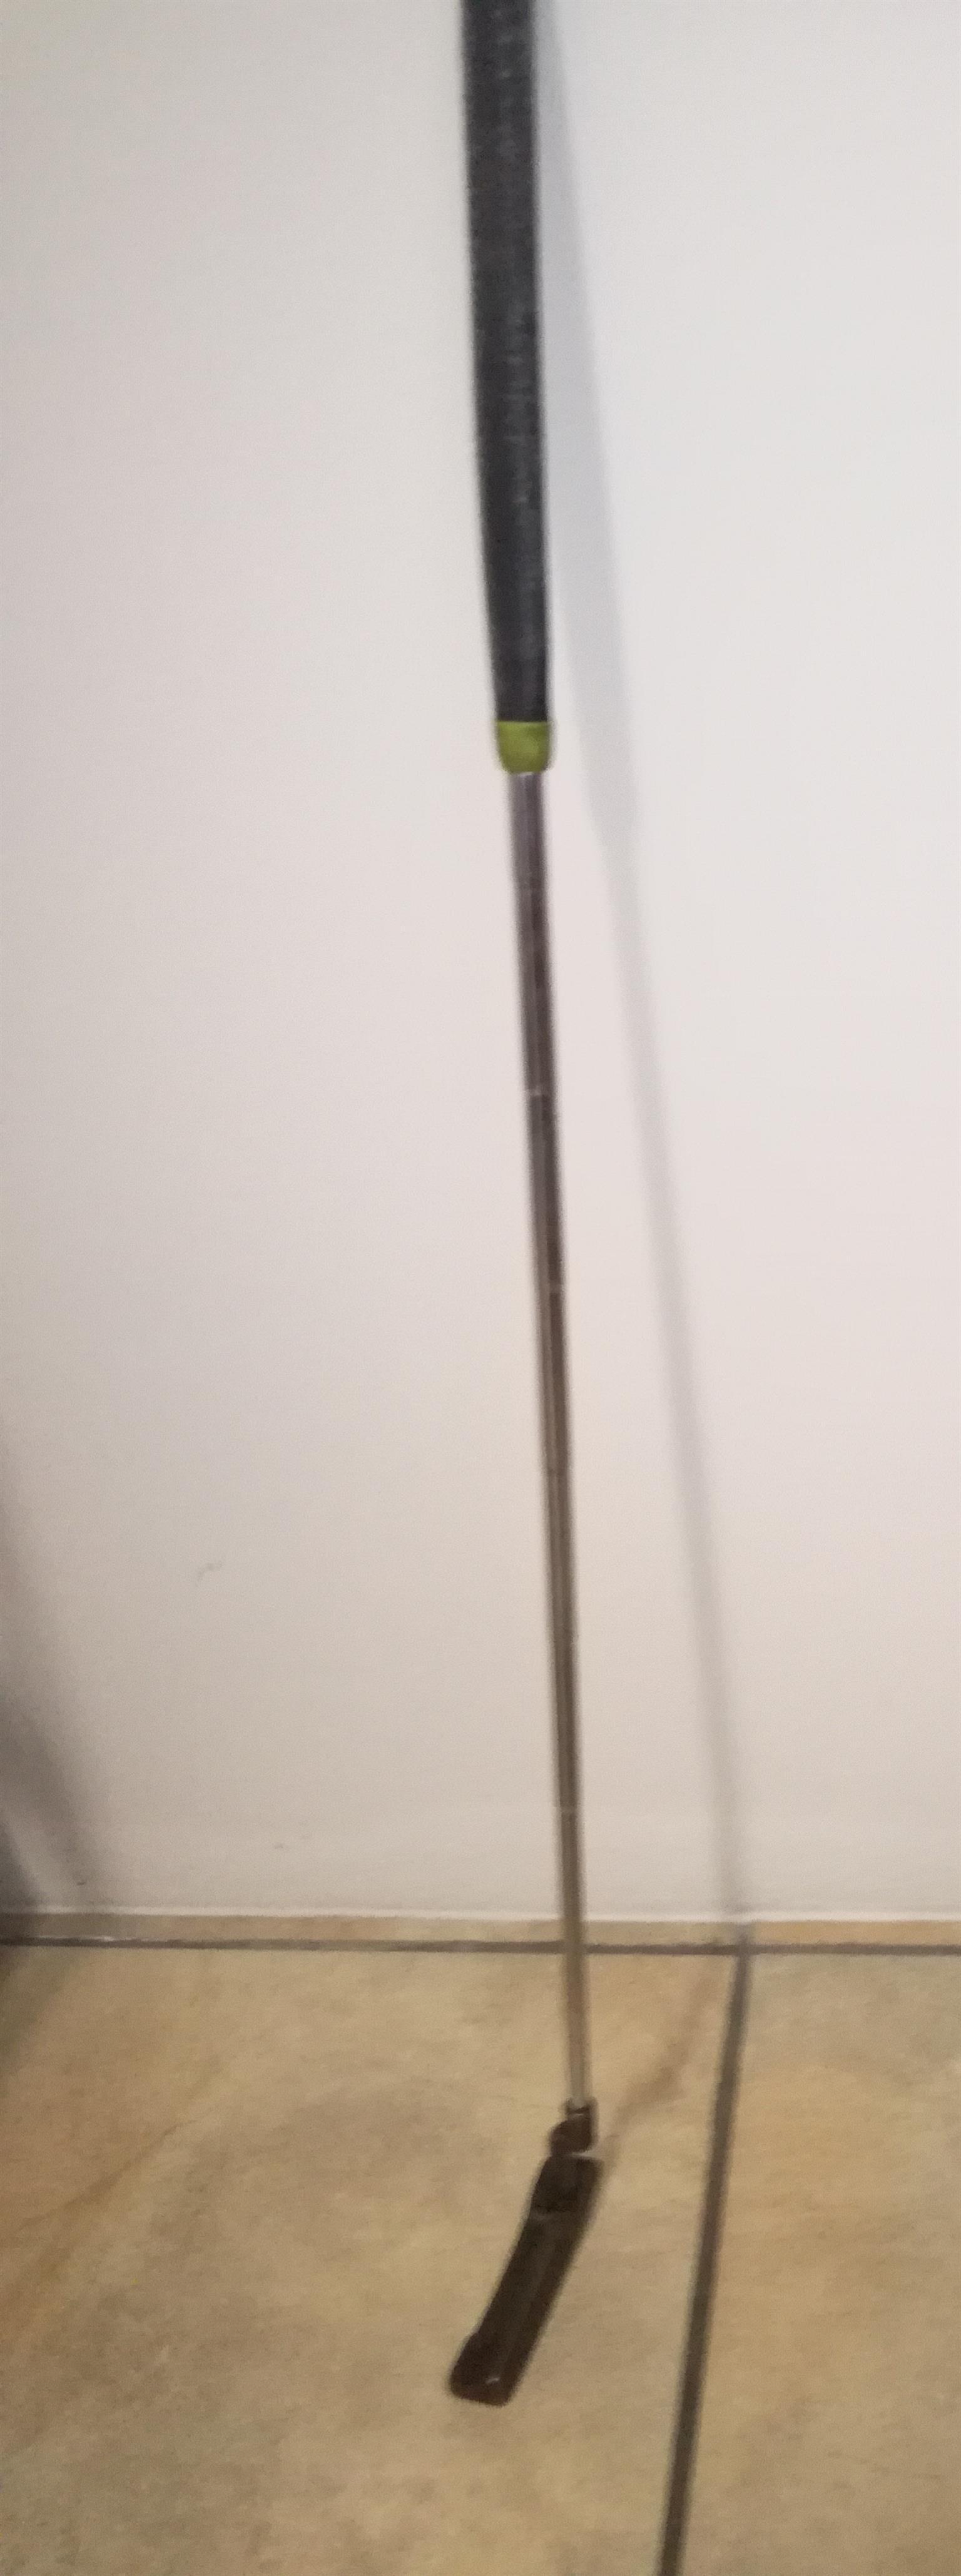 Ping Anser beryllium Copperhead putter for sale